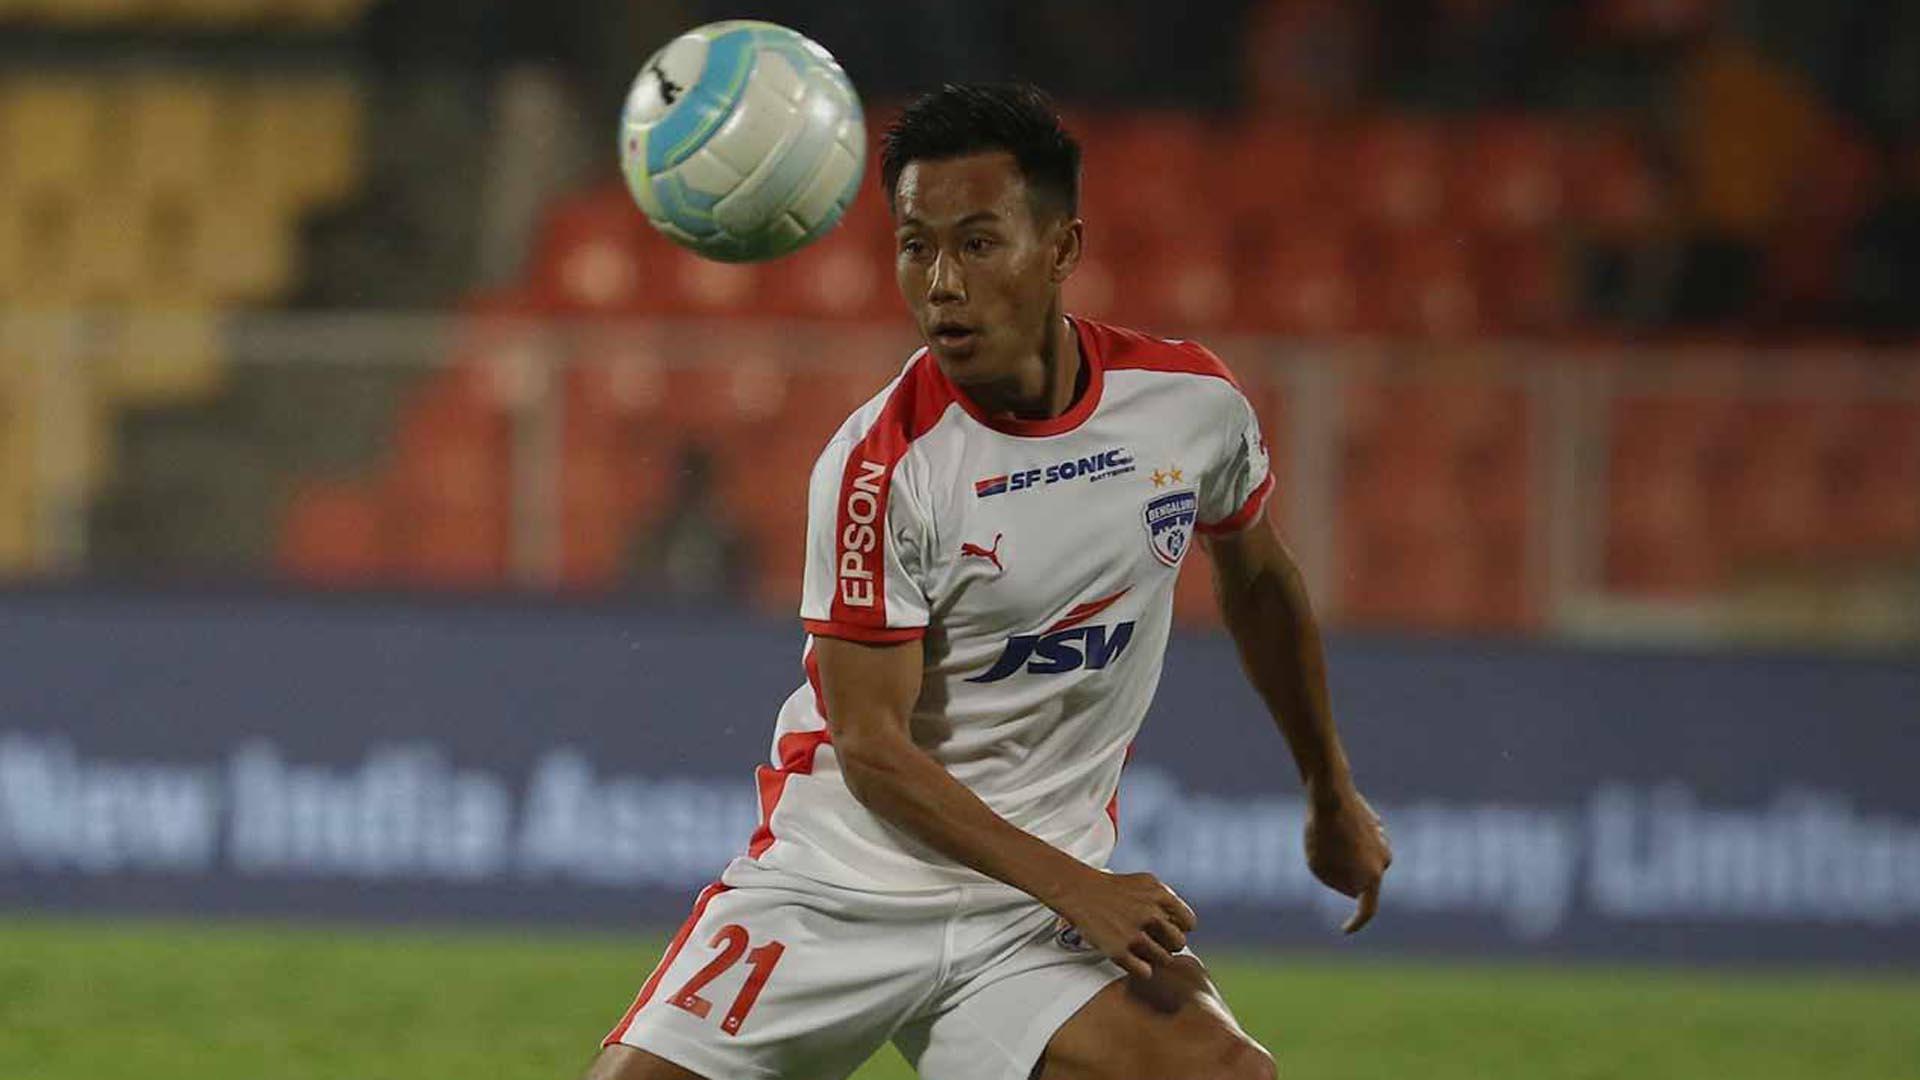 Udanta Singh FC Pune City Bengaluru FC ISL 4 2017/2018